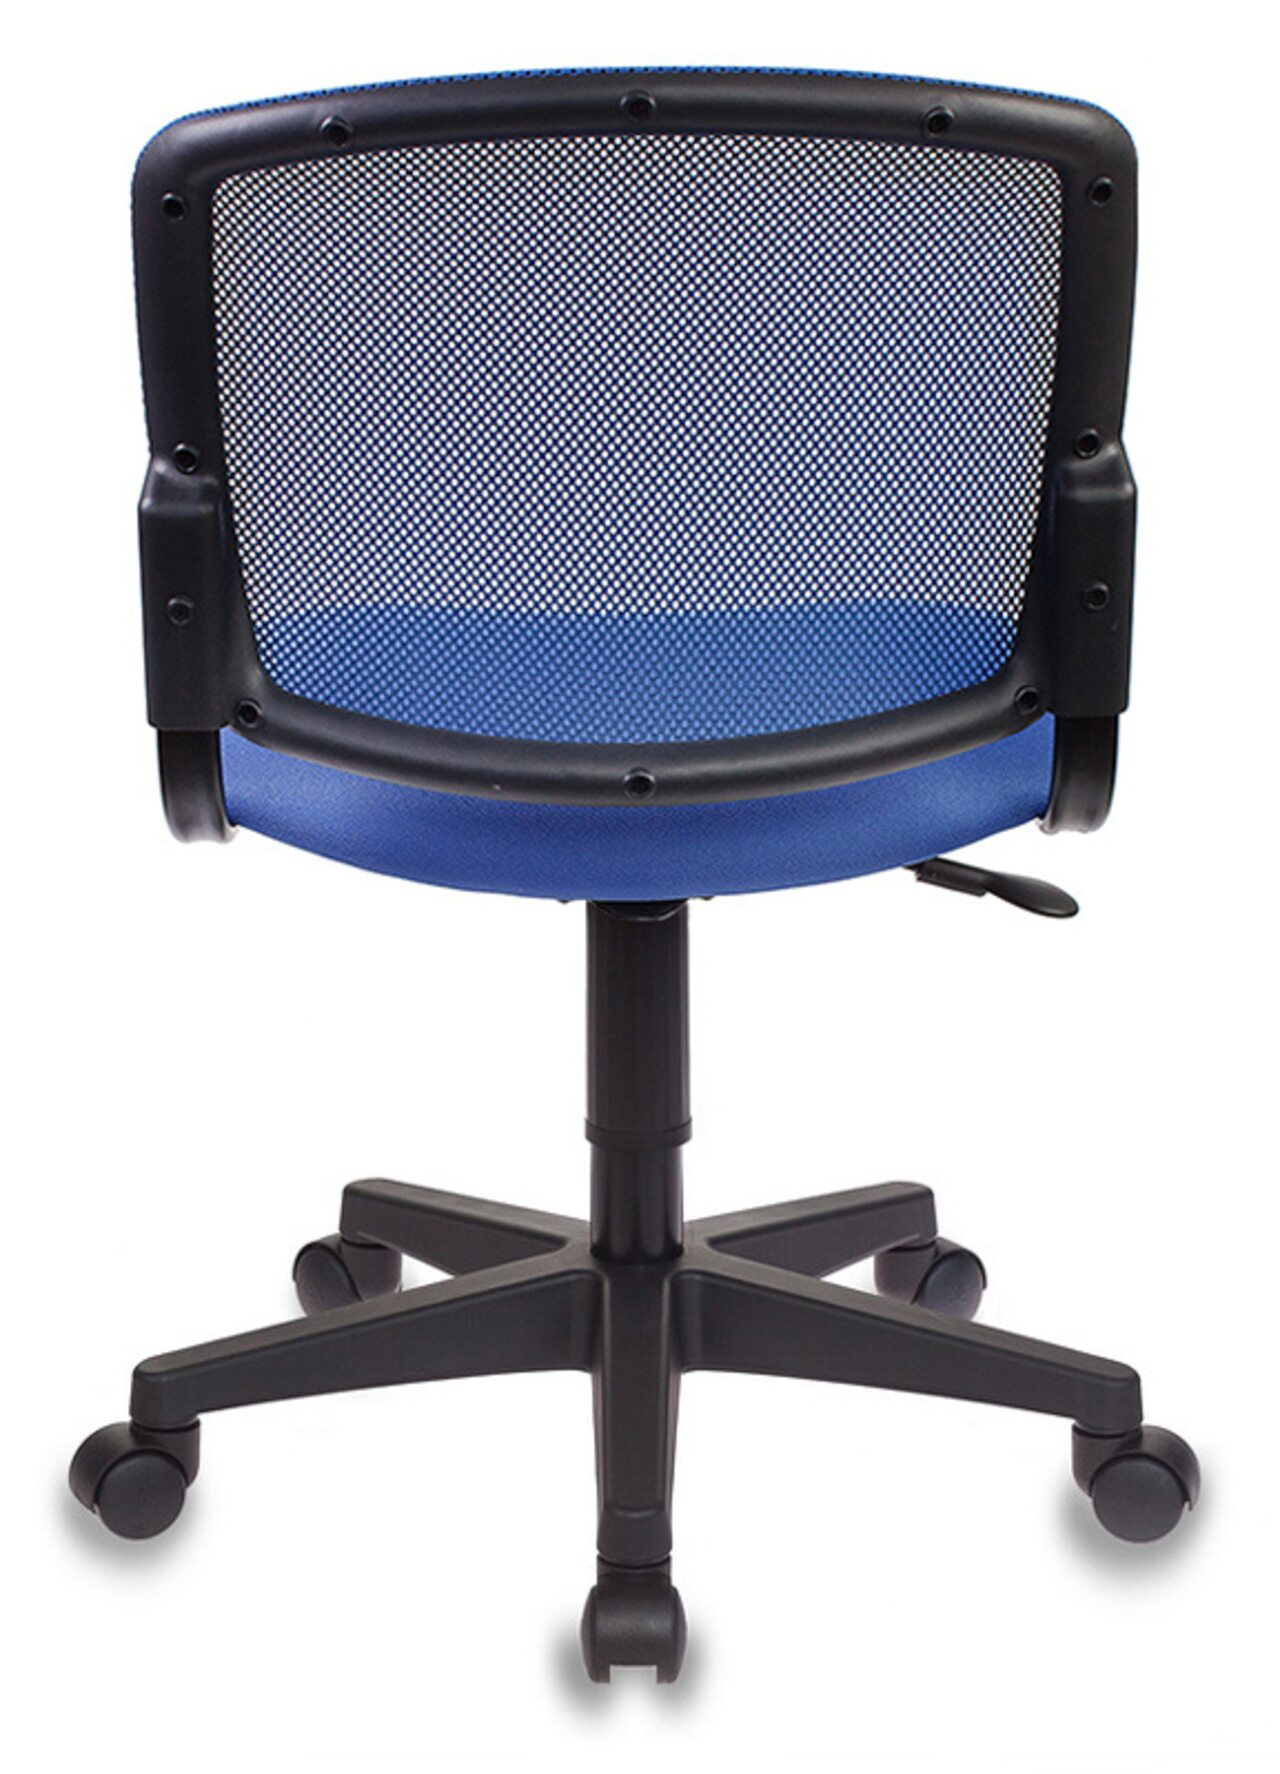 Кресло для персонала CH-296/BL/15-10 - фото 7